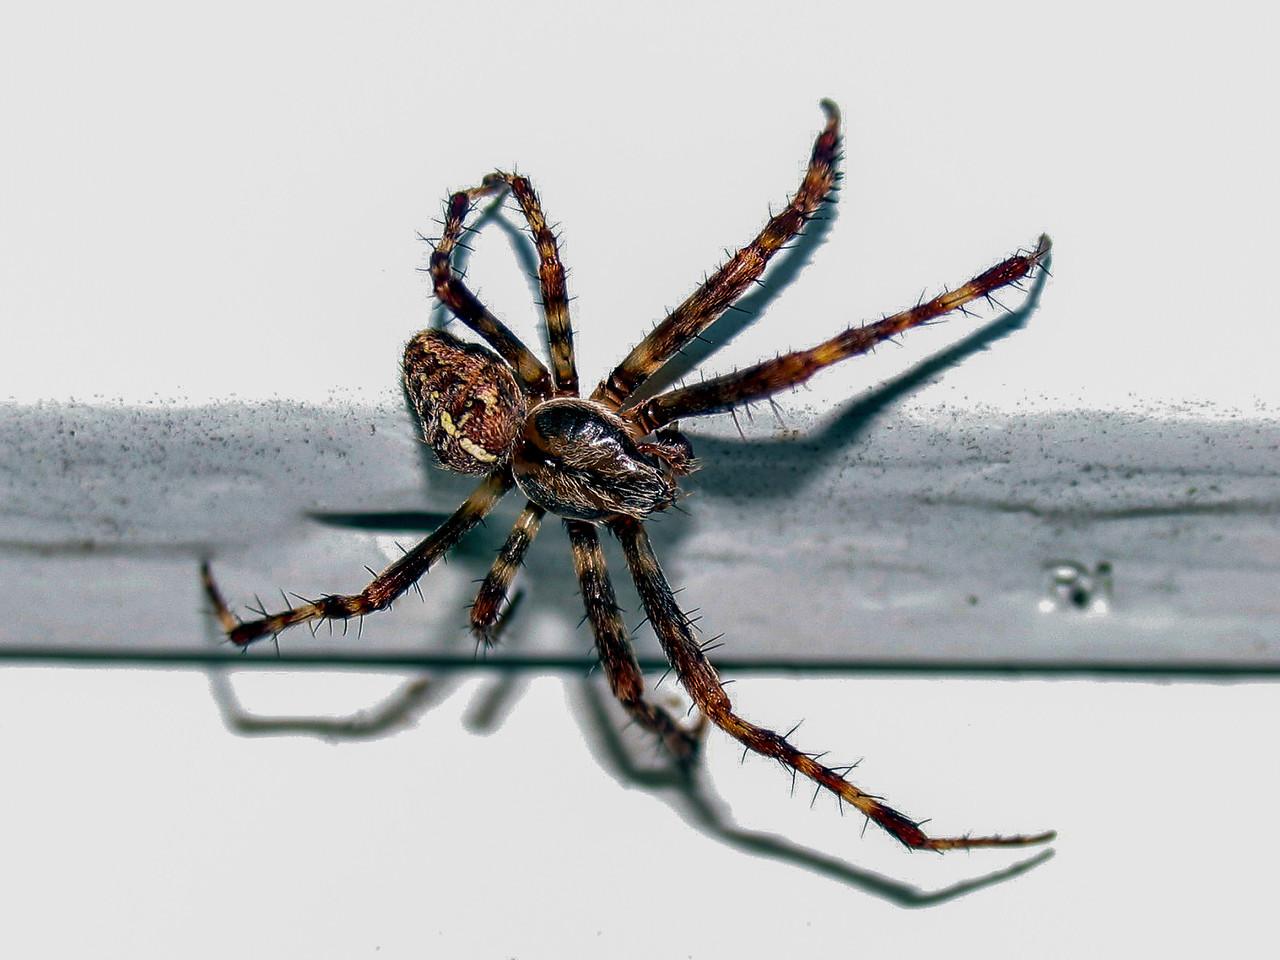 Spider crawling on aluminum siding - October 2005